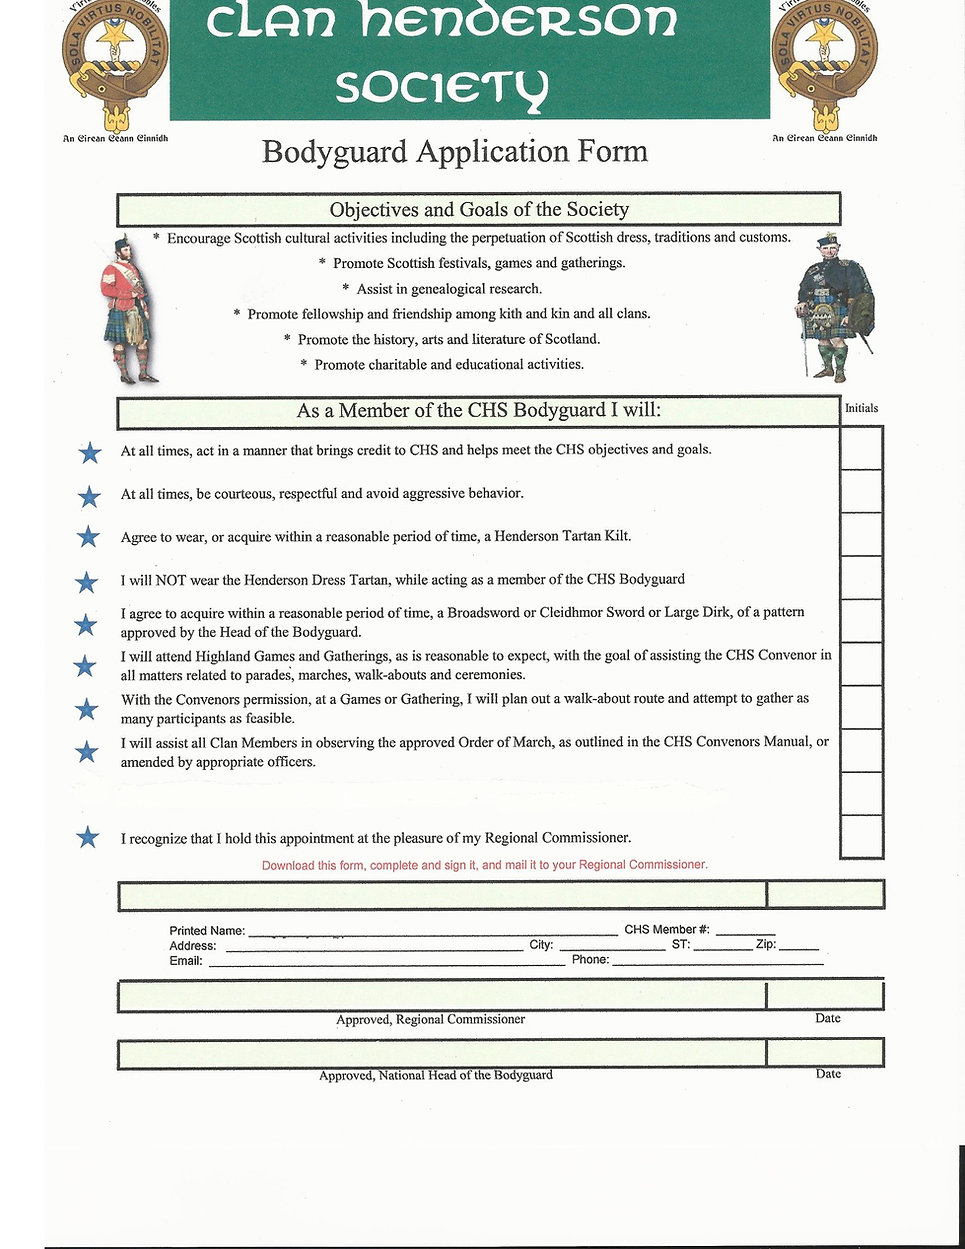 Bodyguard-Application 2019 copy2.jpg